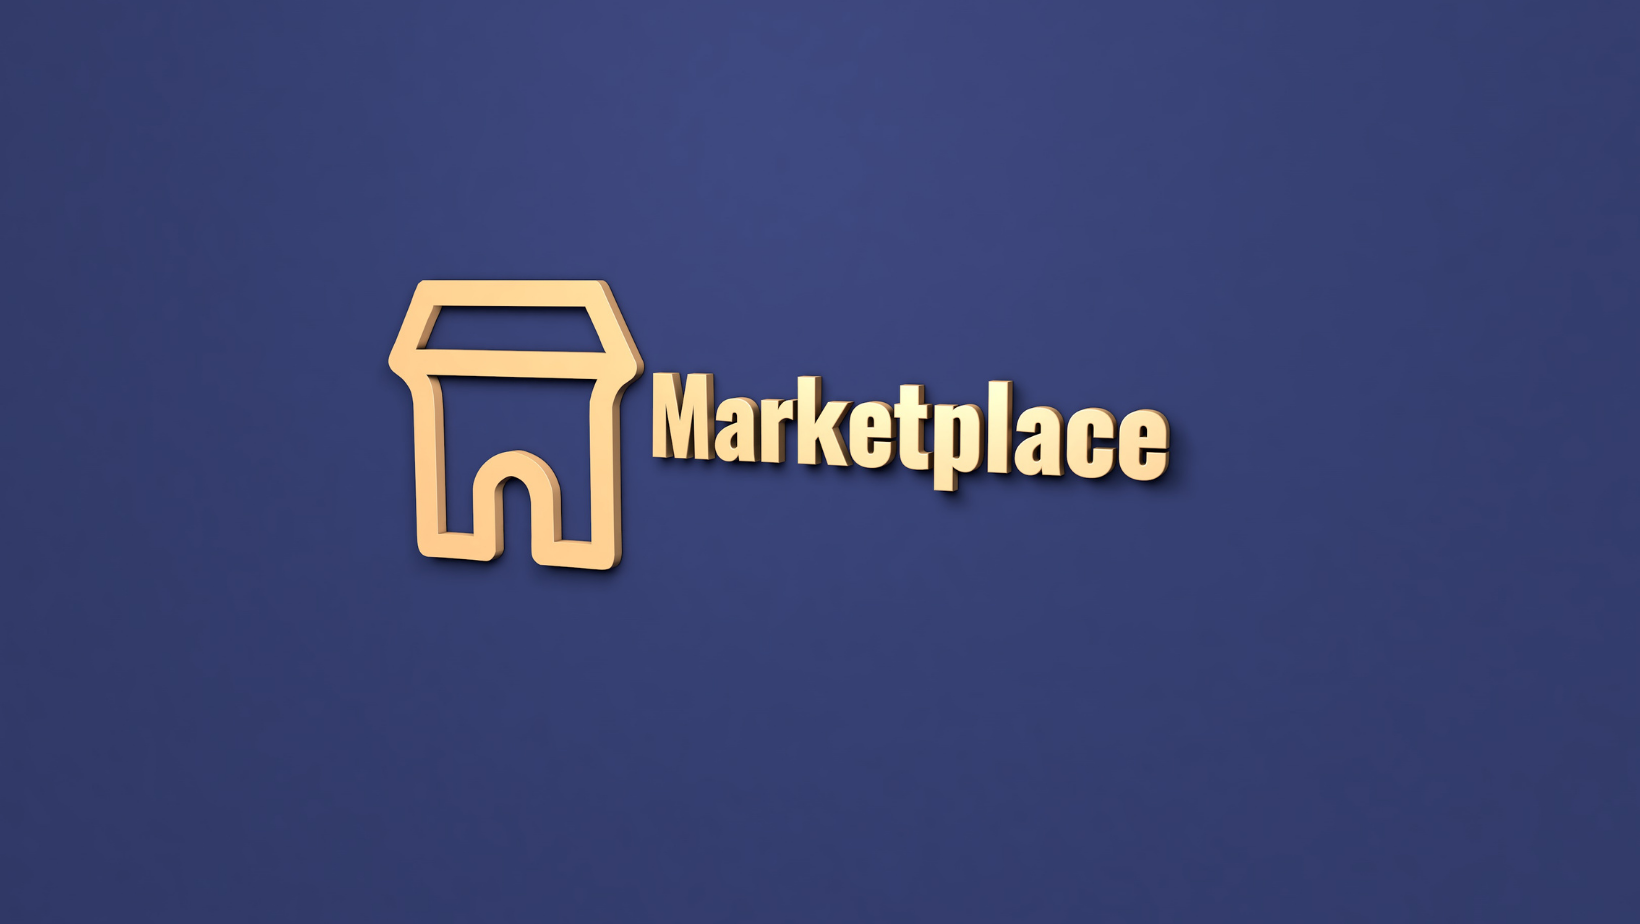 jak zarabiać na Facebooku marketplace